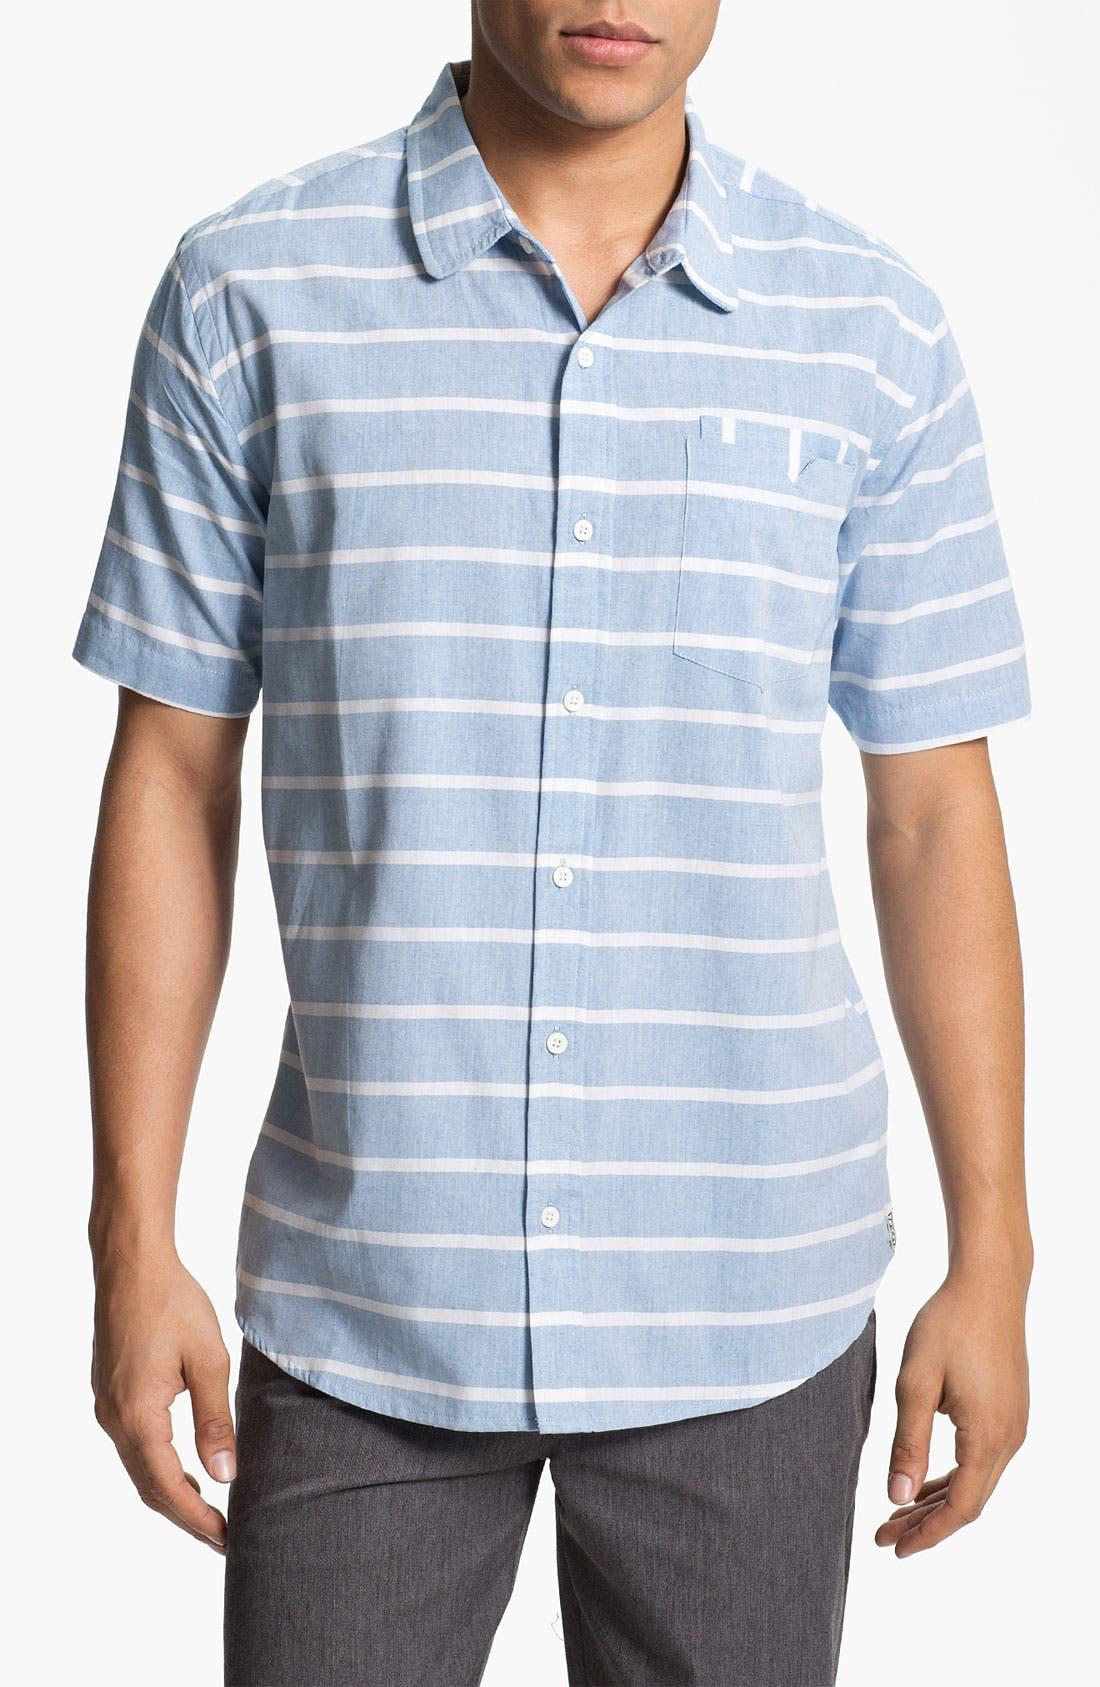 Alternate Image 1 Selected - Ezekiel 'Newmar' Stripe Woven Shirt